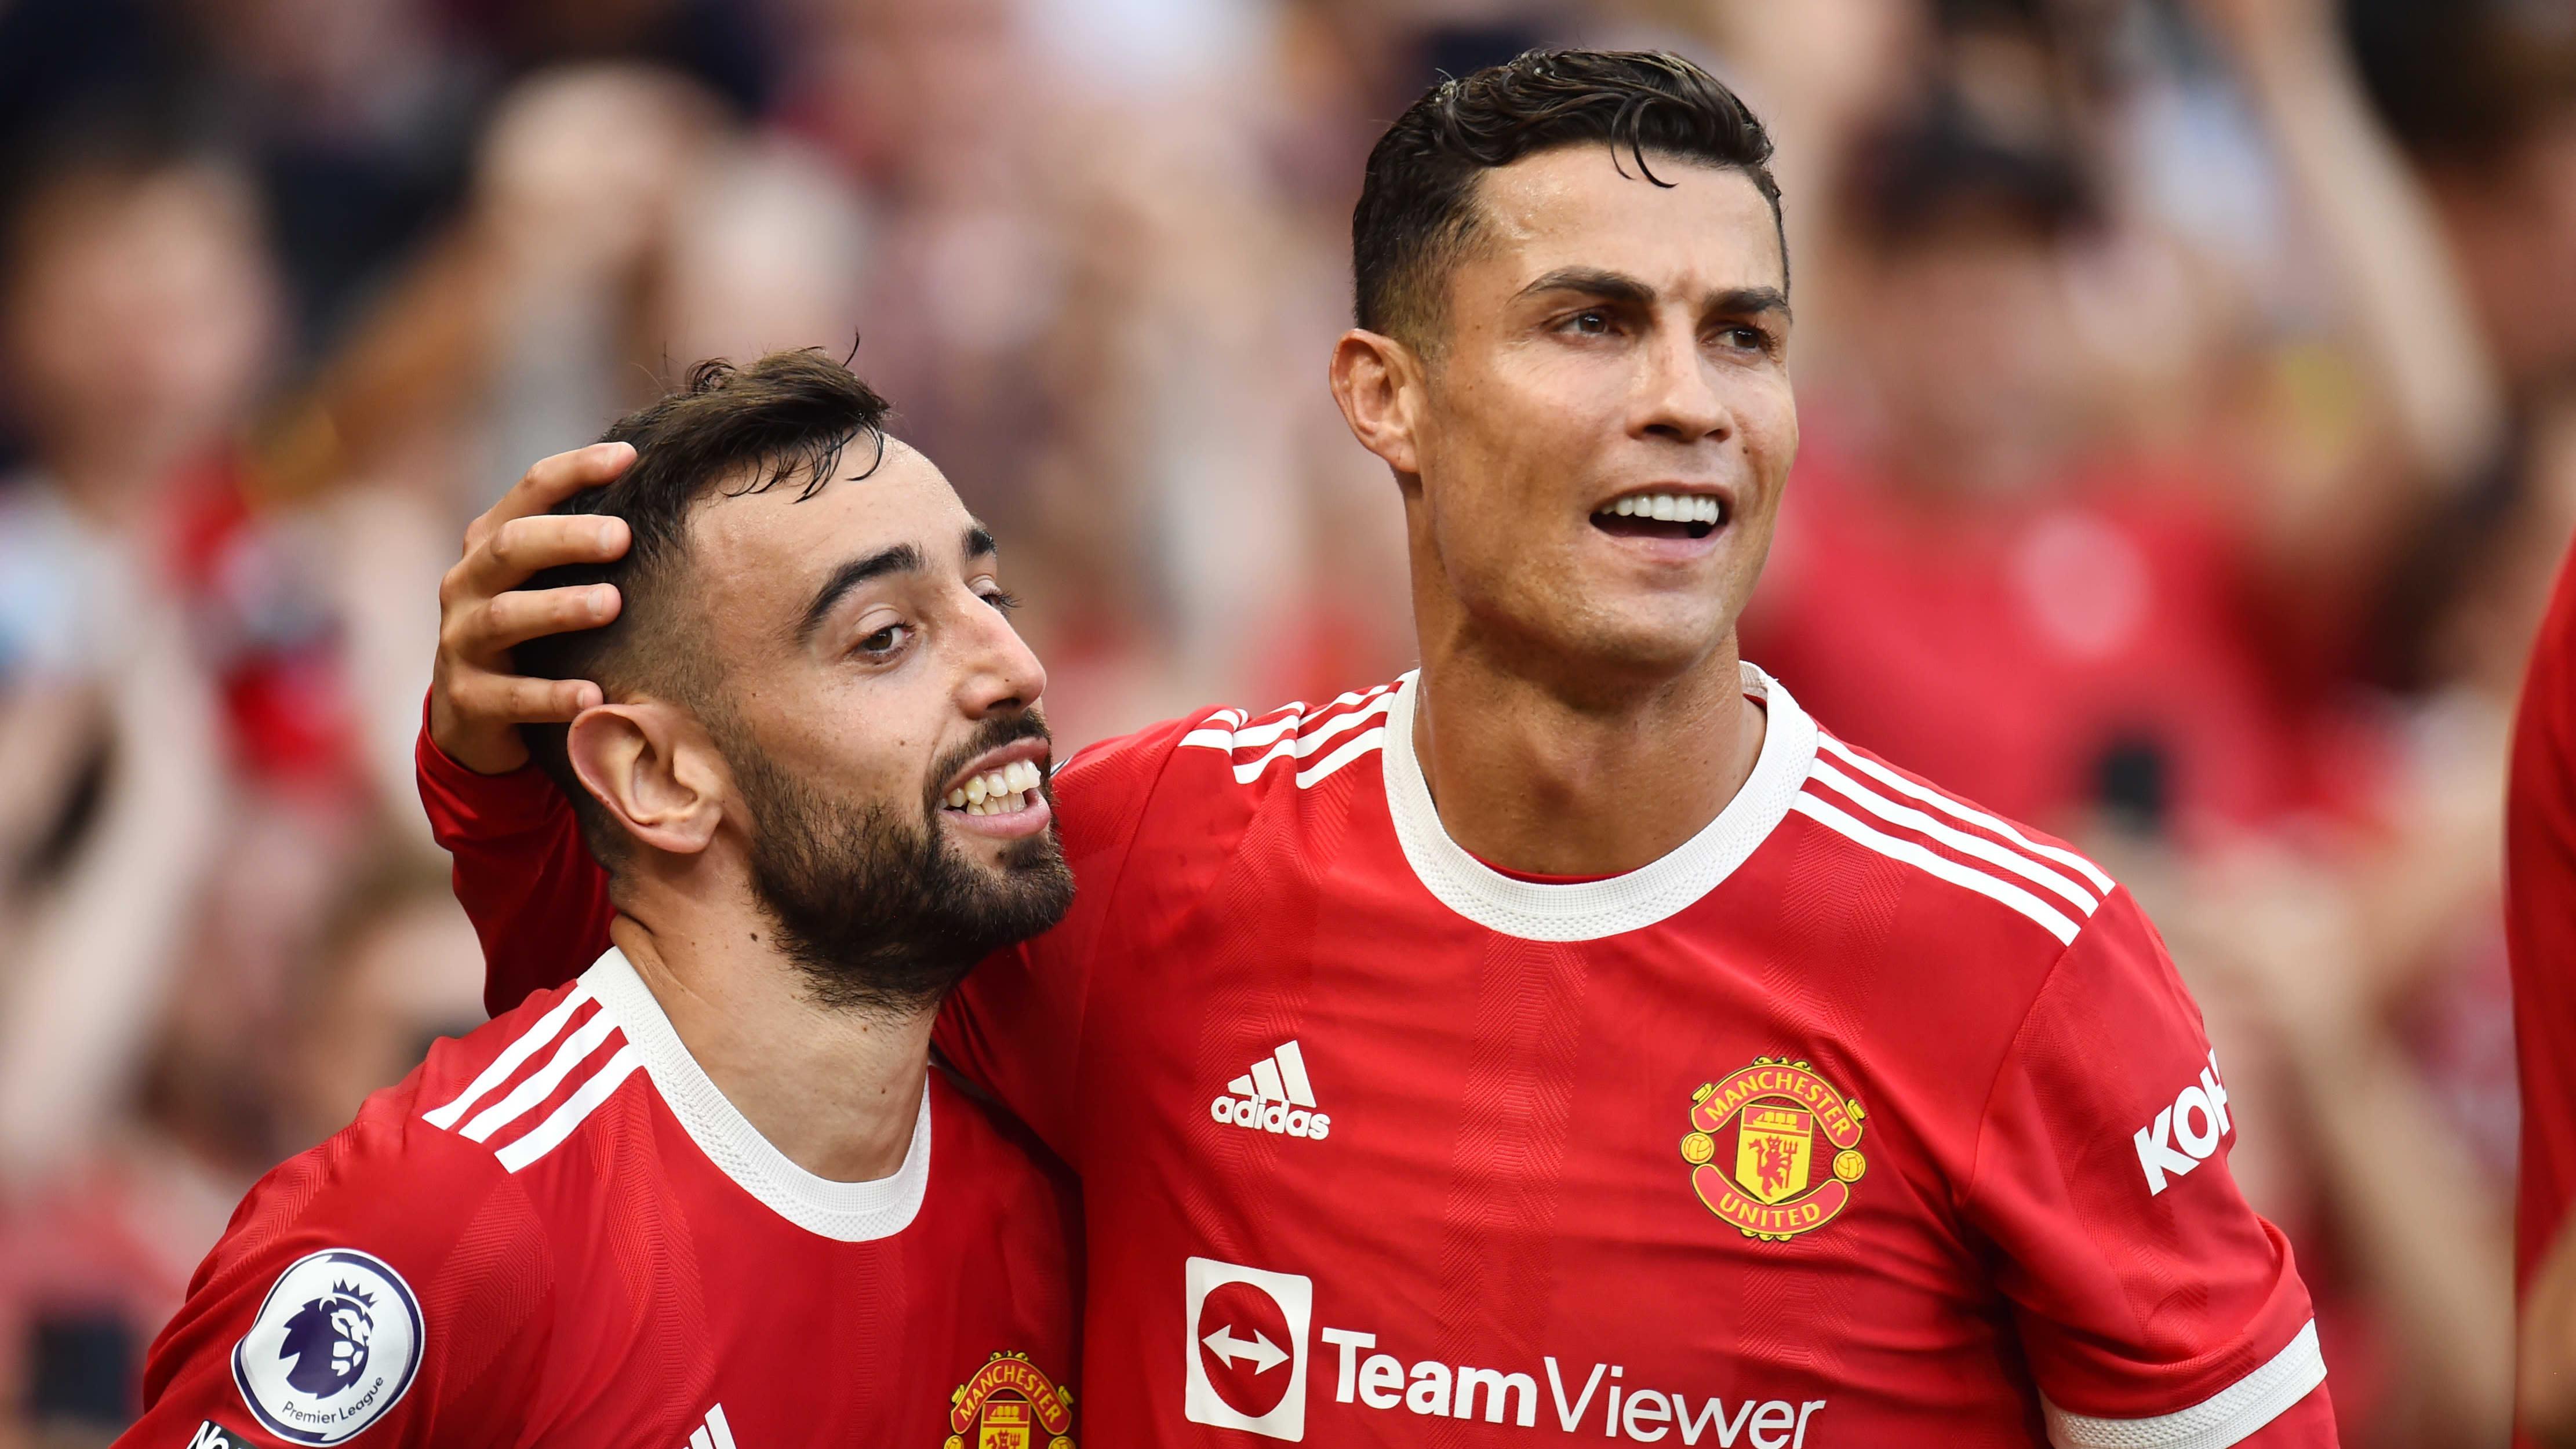 Unitedin Bruno Fernandes ja uusi seurakaveri Cristiano Ronaldo